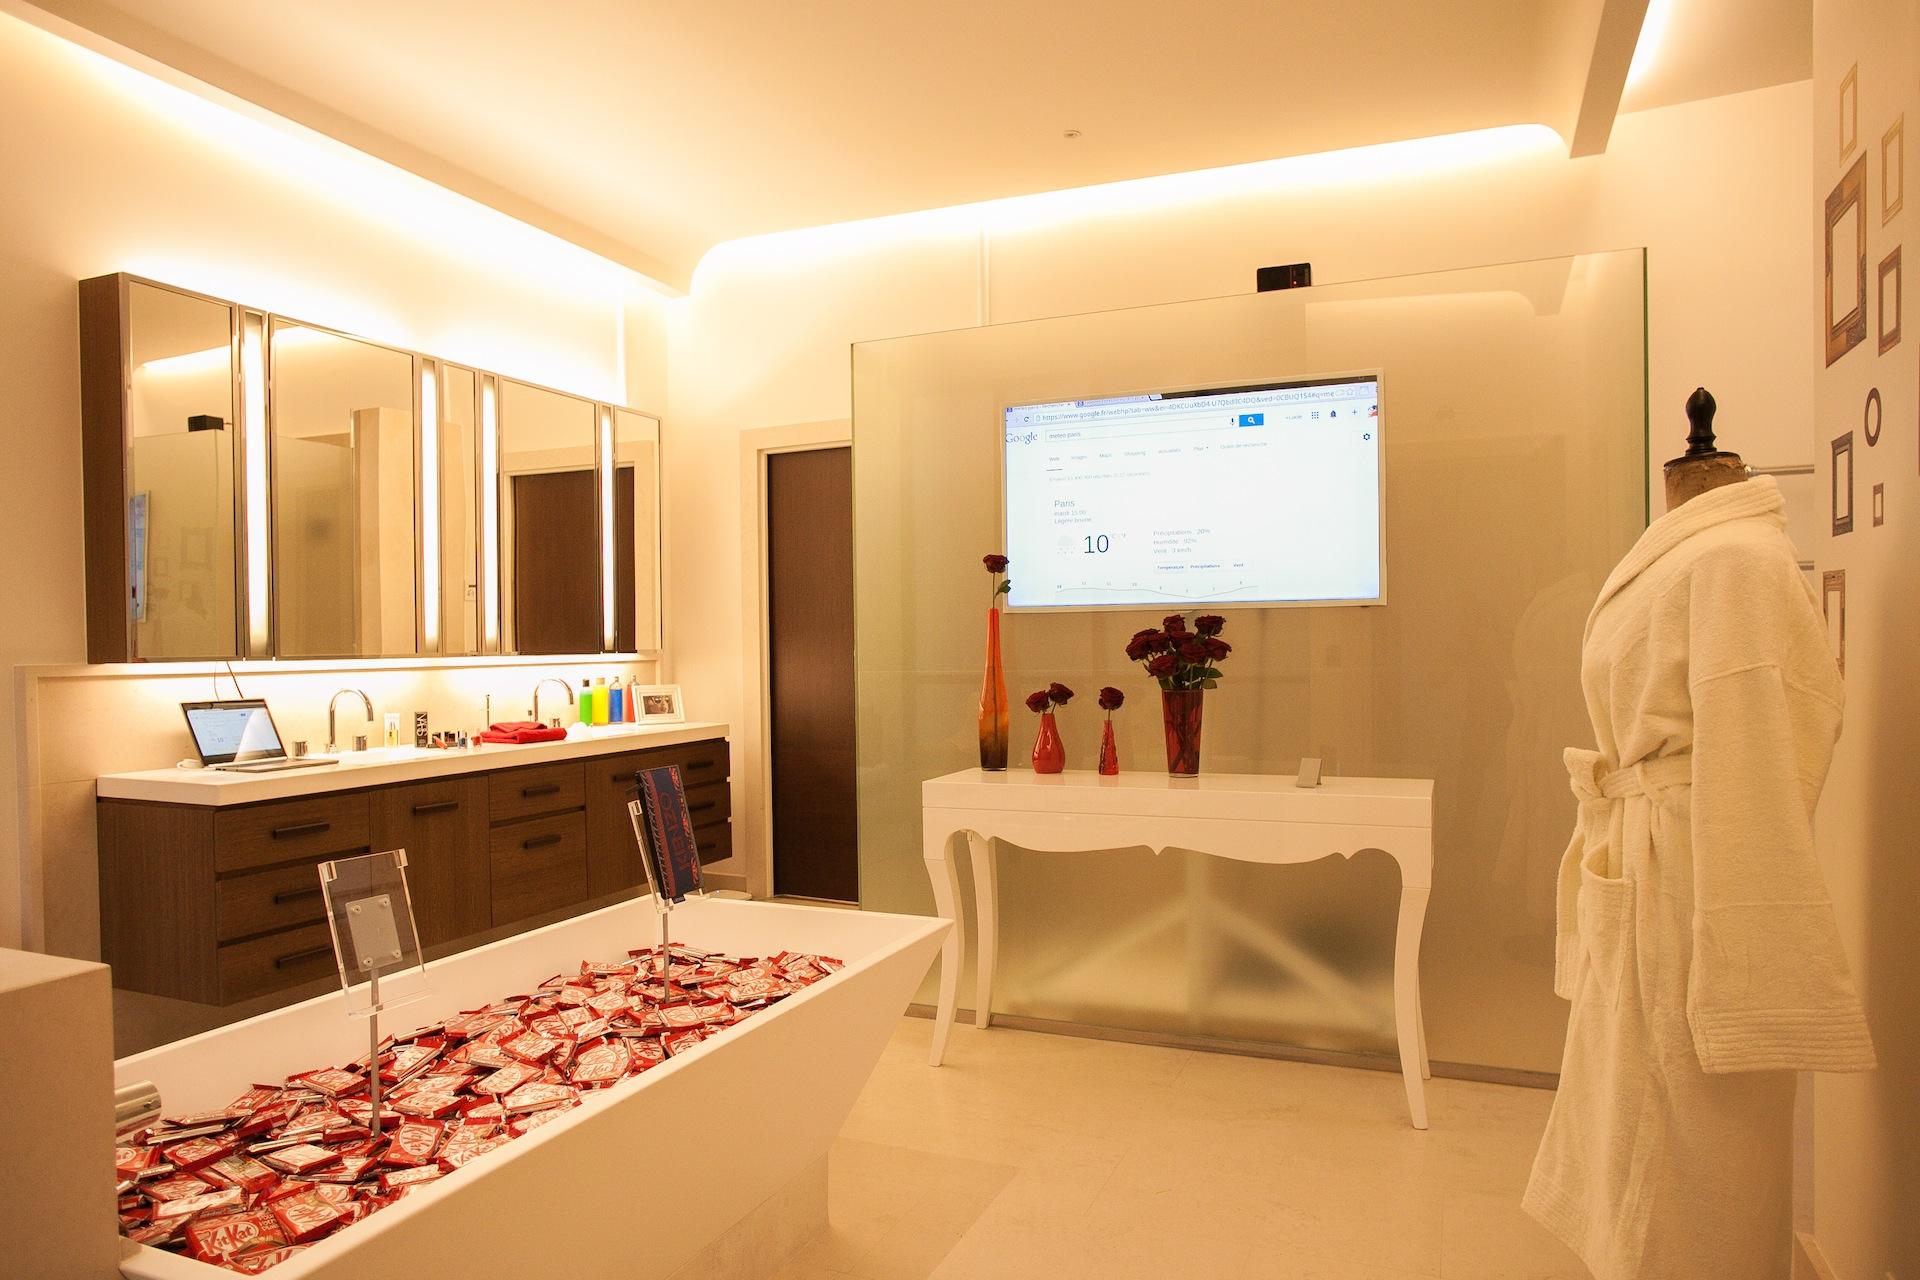 Google house salle de bain weblife for Salle de bain du futur